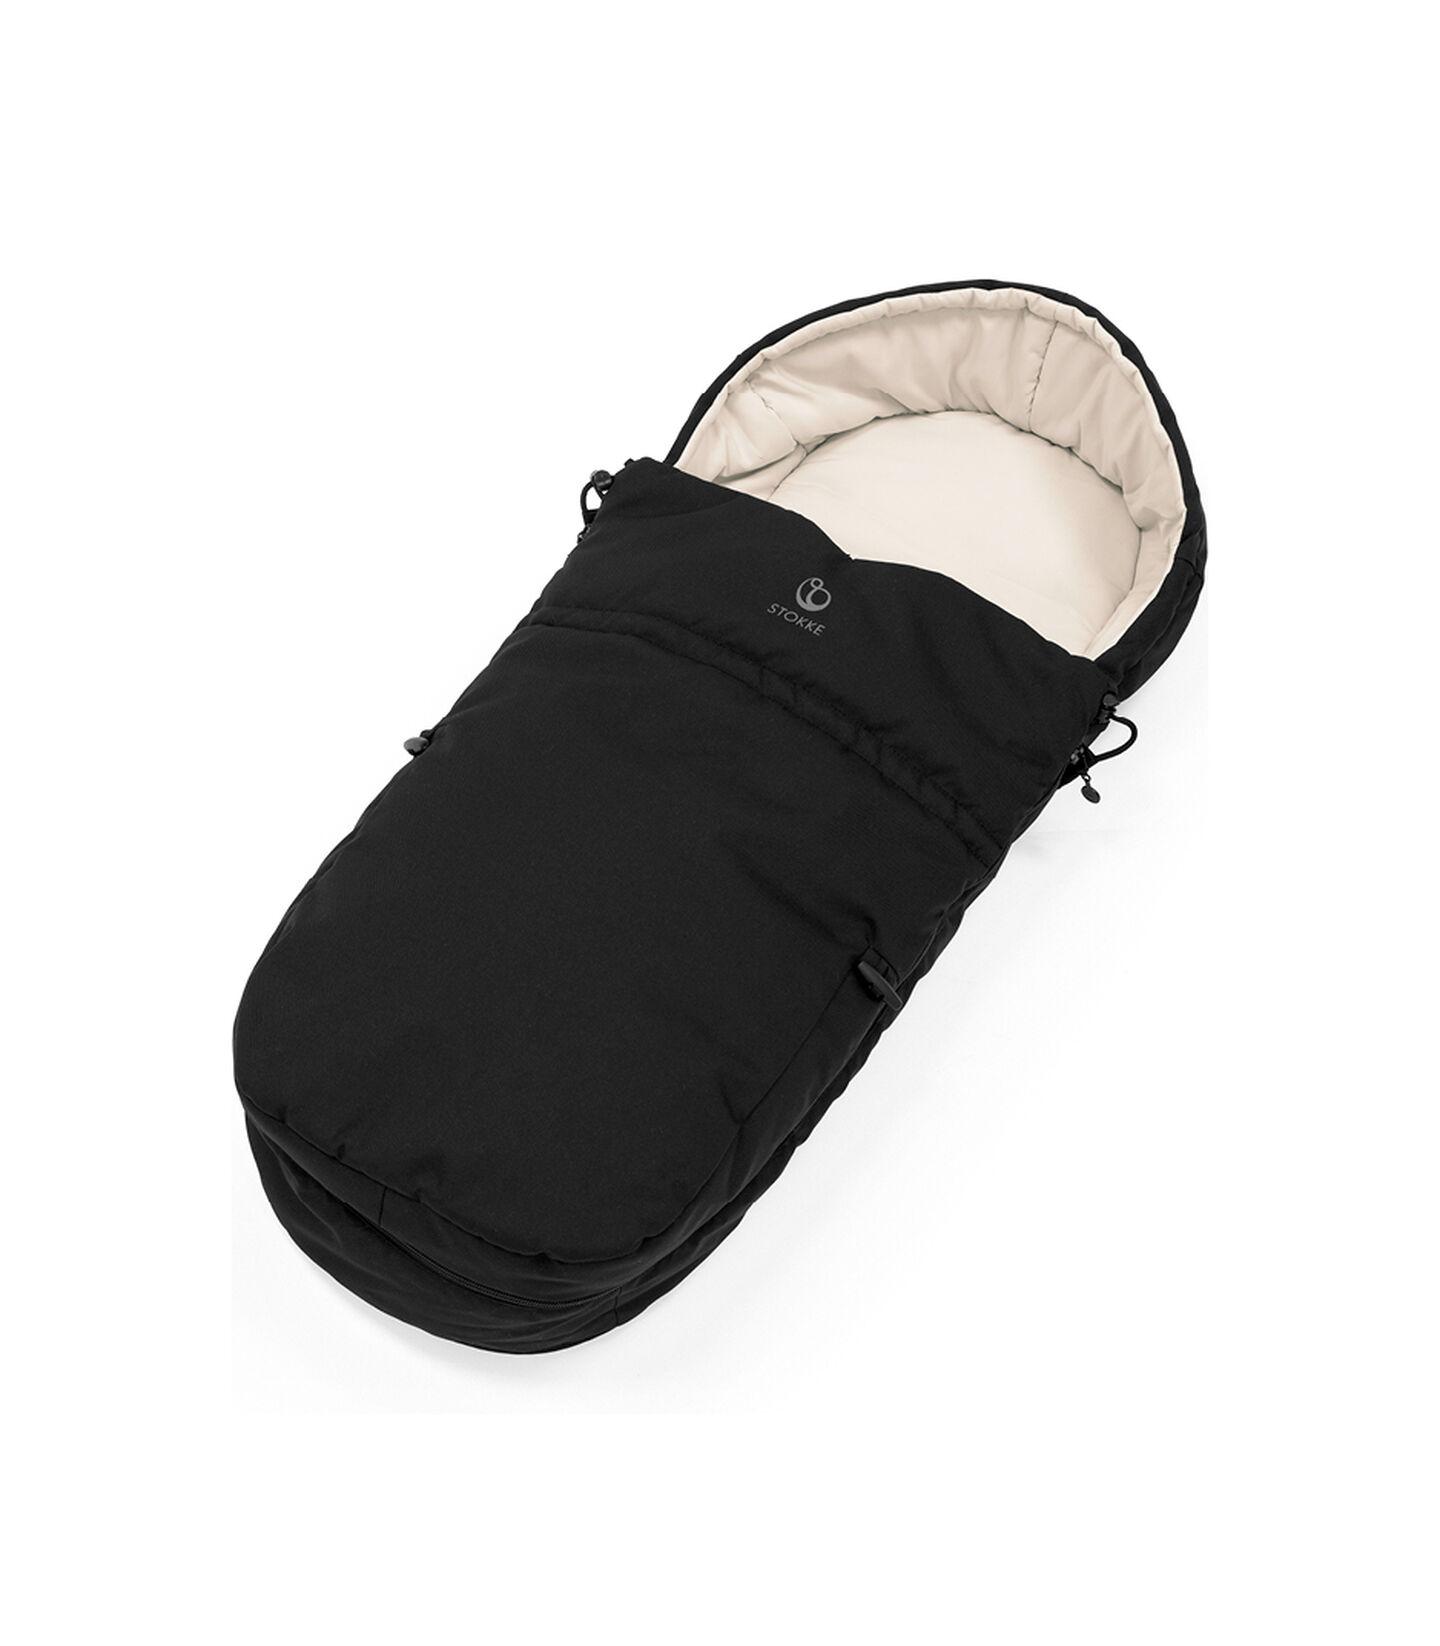 Stokke® Stroller Softbag Black, Nero, mainview view 1